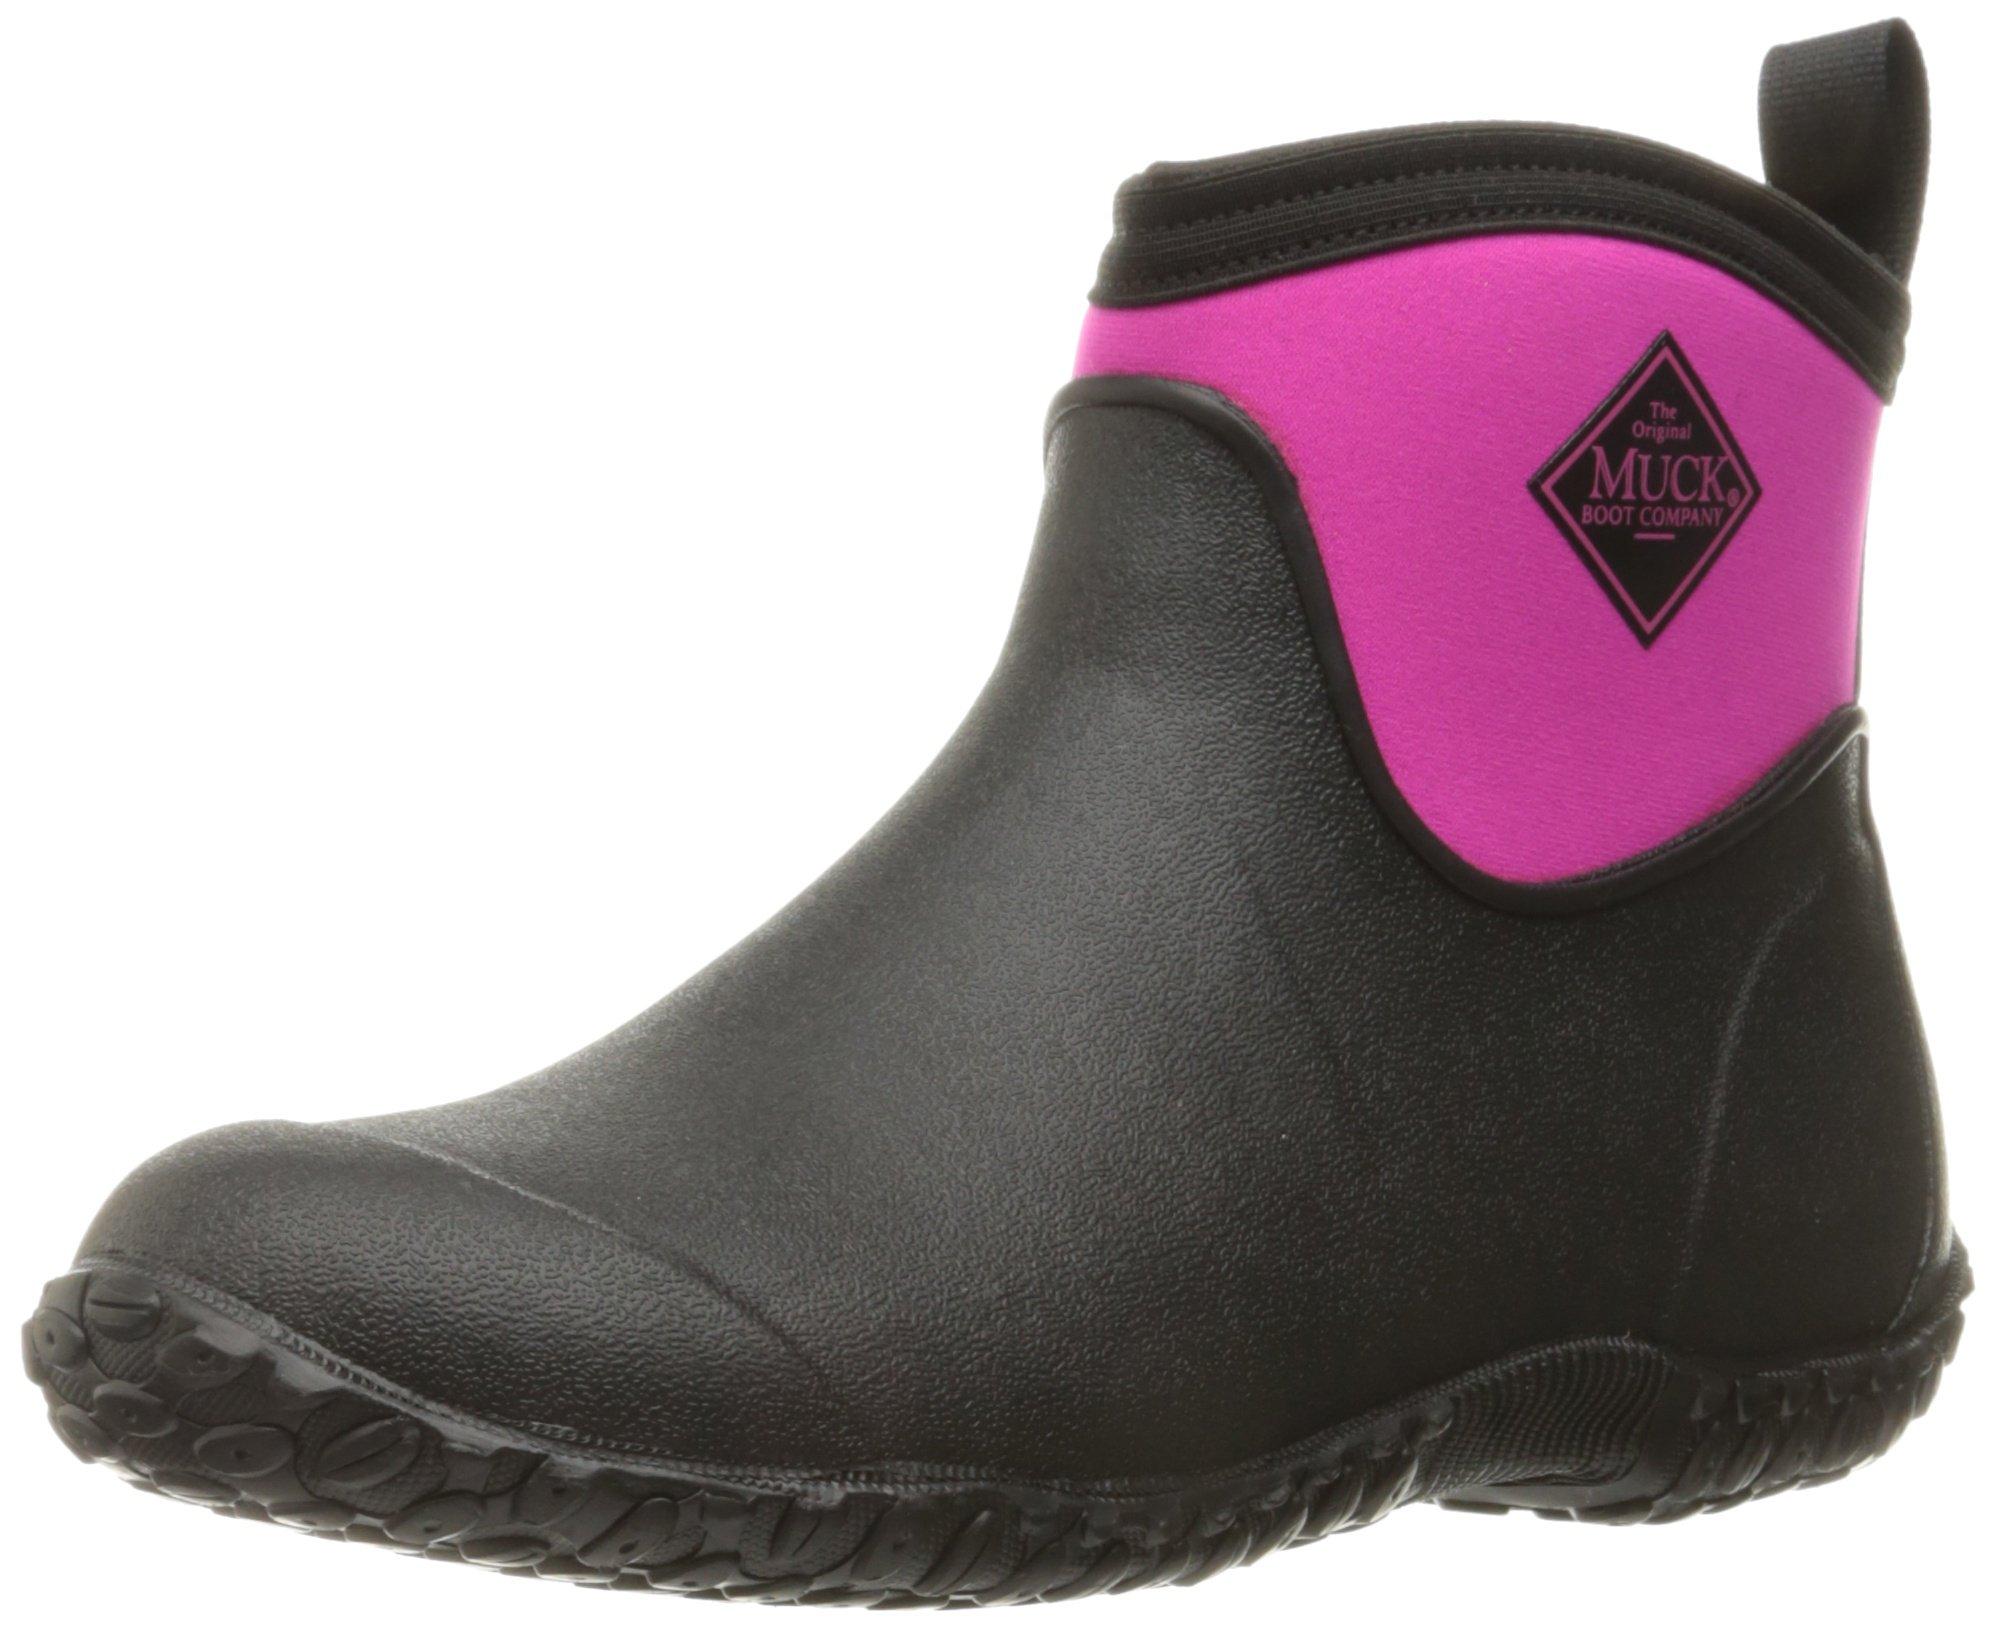 Muck Muckster Boots AnkleBottesamp; Pluie De Women's Bottines FemmeNoirblack Ii Pink36 Eu hot eD92WYbEHI